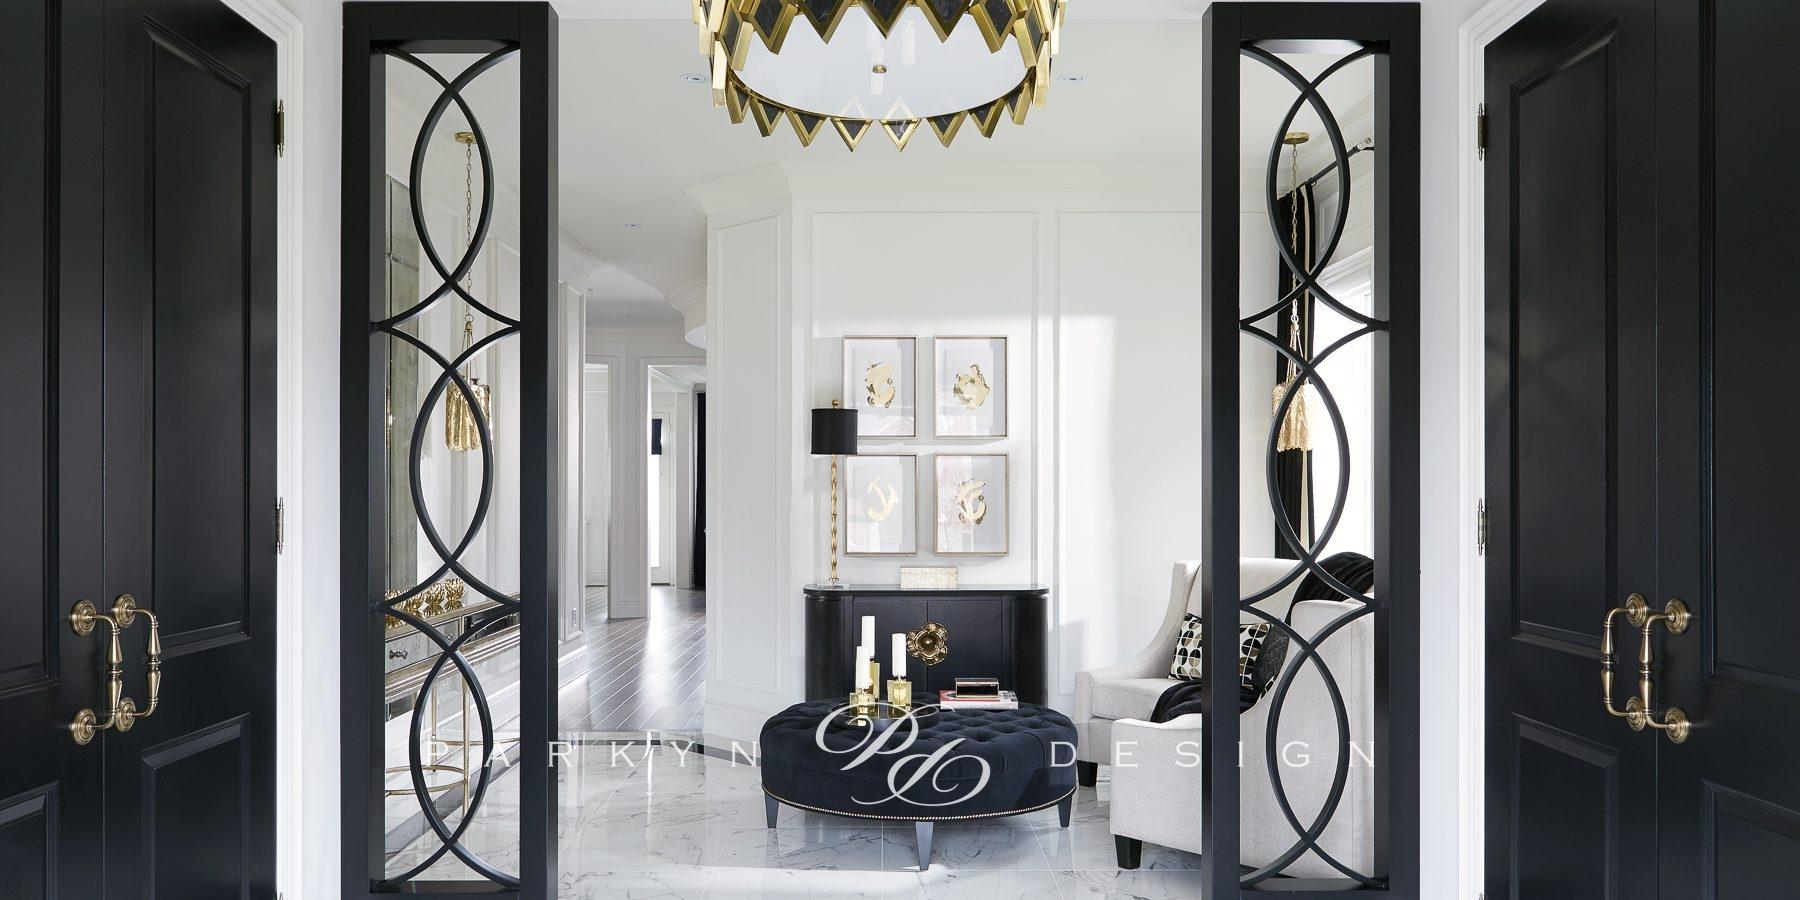 The Statement House Parkyn Design Interior Design